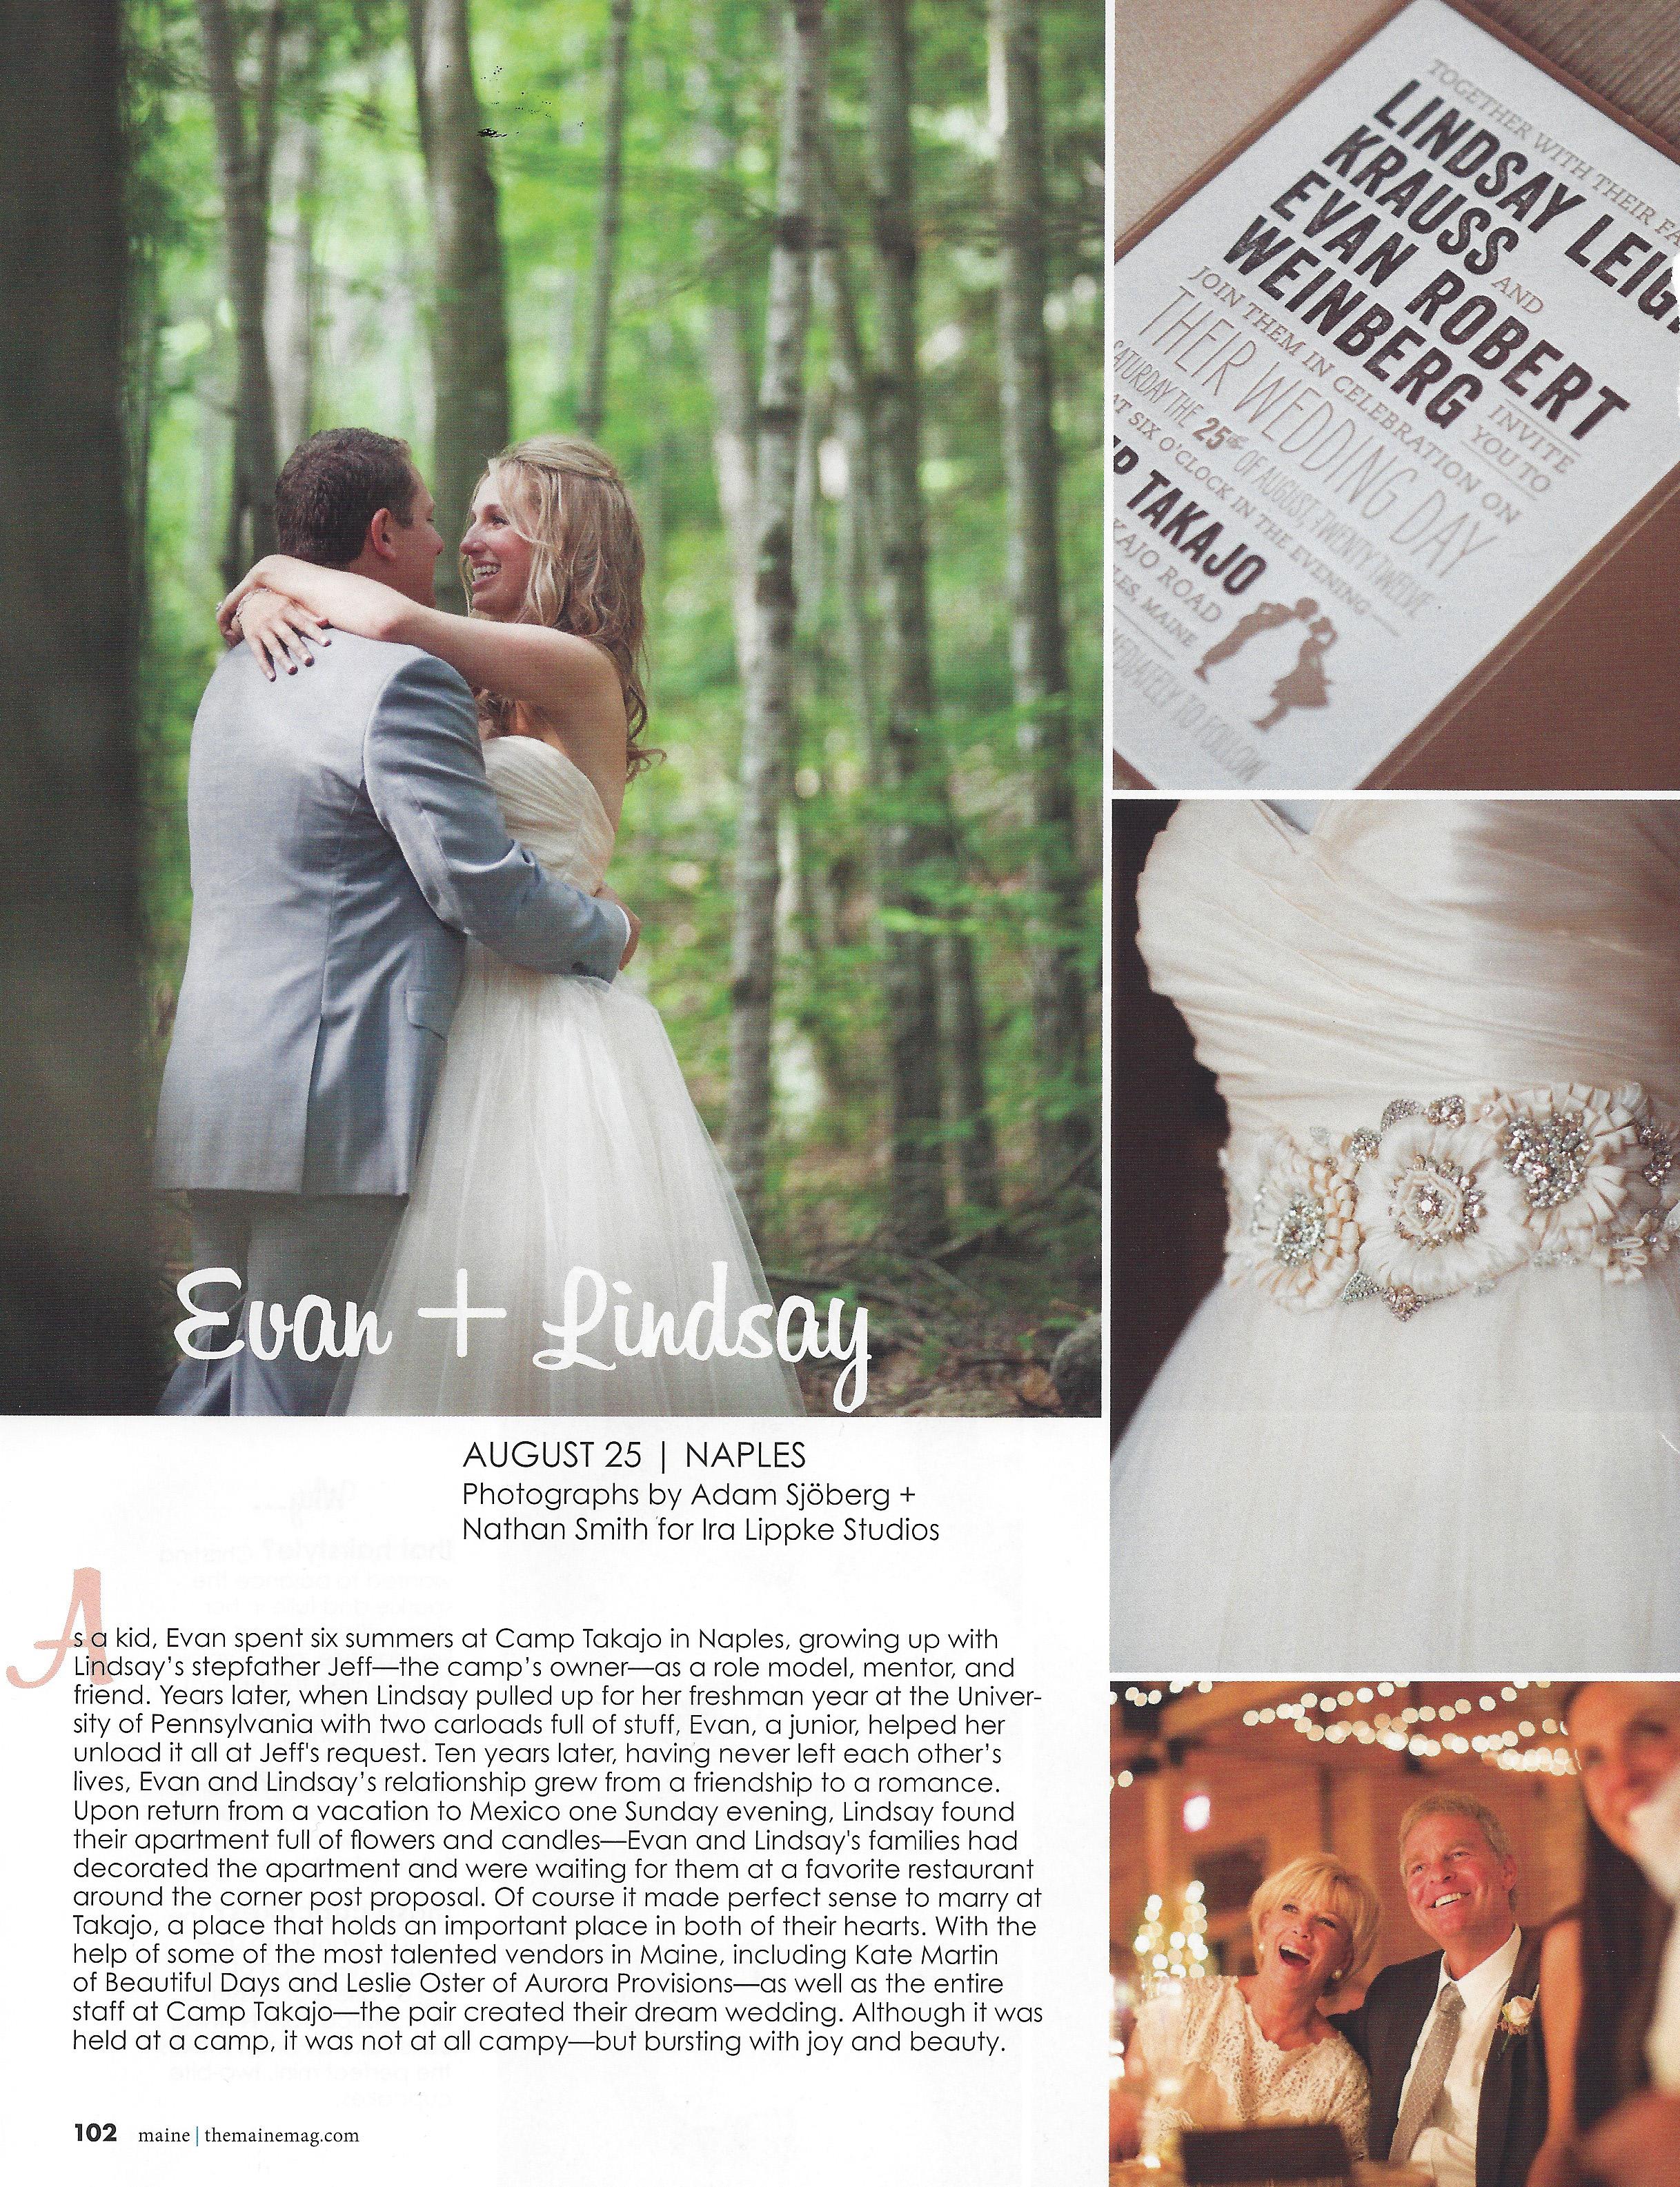 Maine Summer Camp Wedding Maine wedding planner | Photo Credit: Adam Sjoberg for Ira Lippke Studios